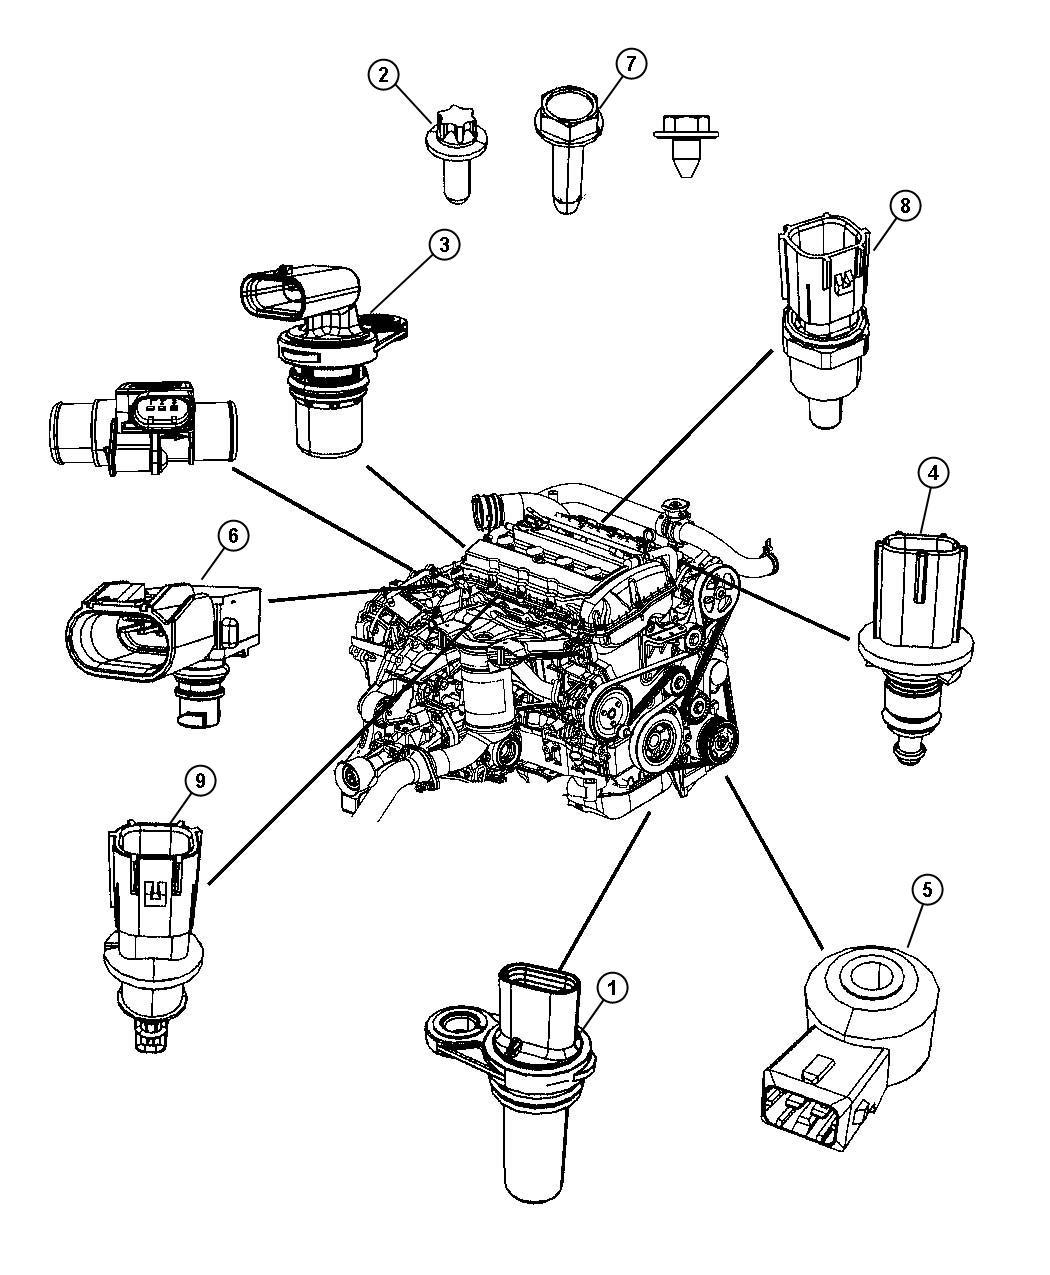 2012 Jeep Compass Sensor. Crankshaft position. Eba